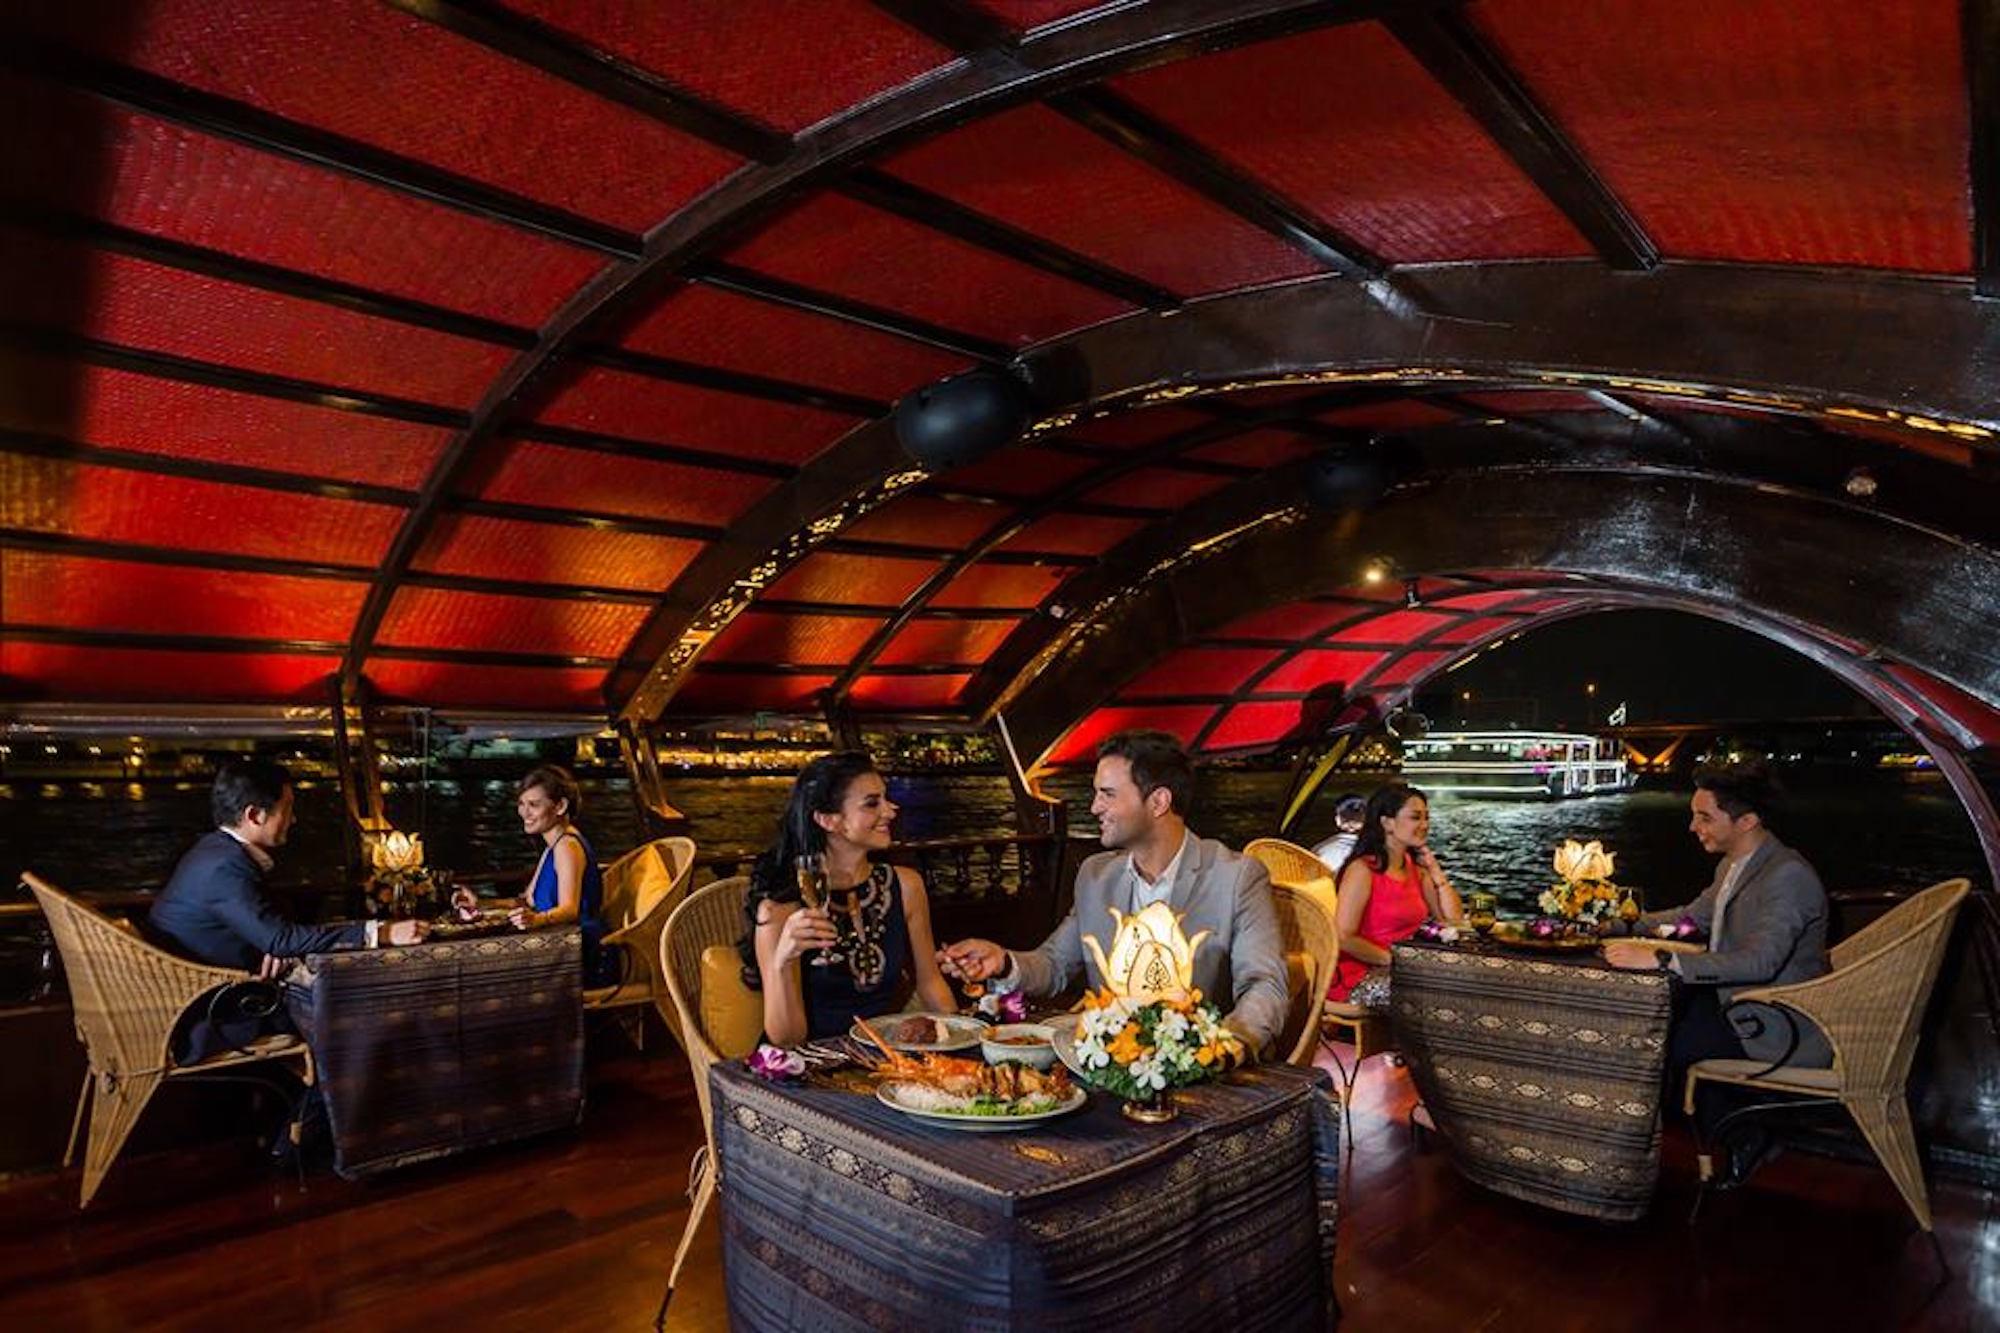 Manohra Dinner Cruise 瑪奴拉號 曼谷遊船 昭披耶河 晚餐 曼谷 昭披耶河